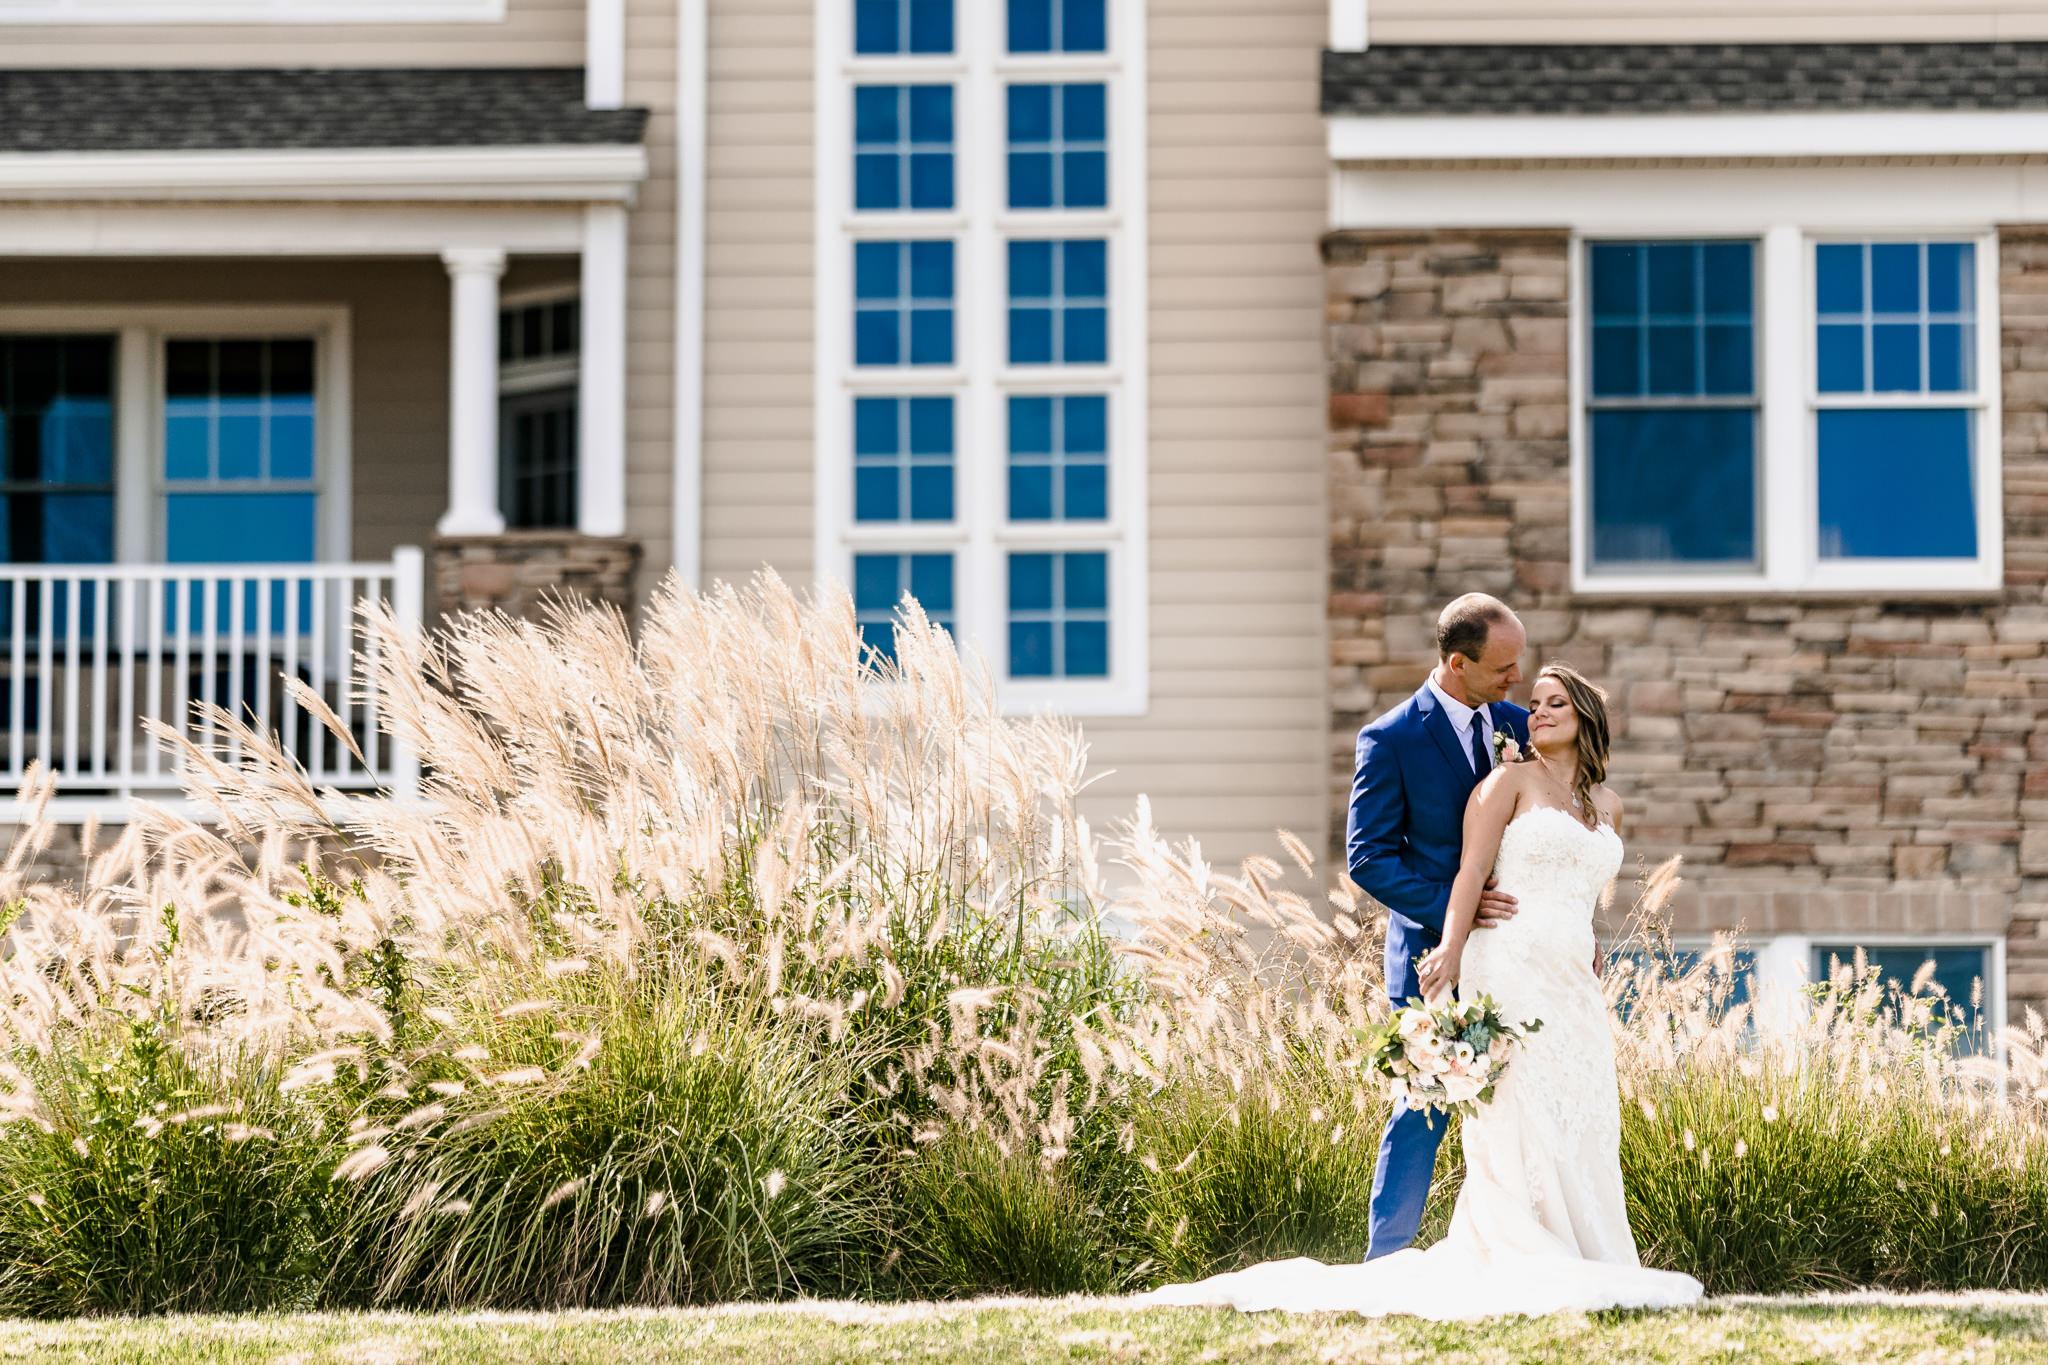 Culos-Sheraton-Eatontown-Long-Branch-Wedding-Photographer-04.JPG